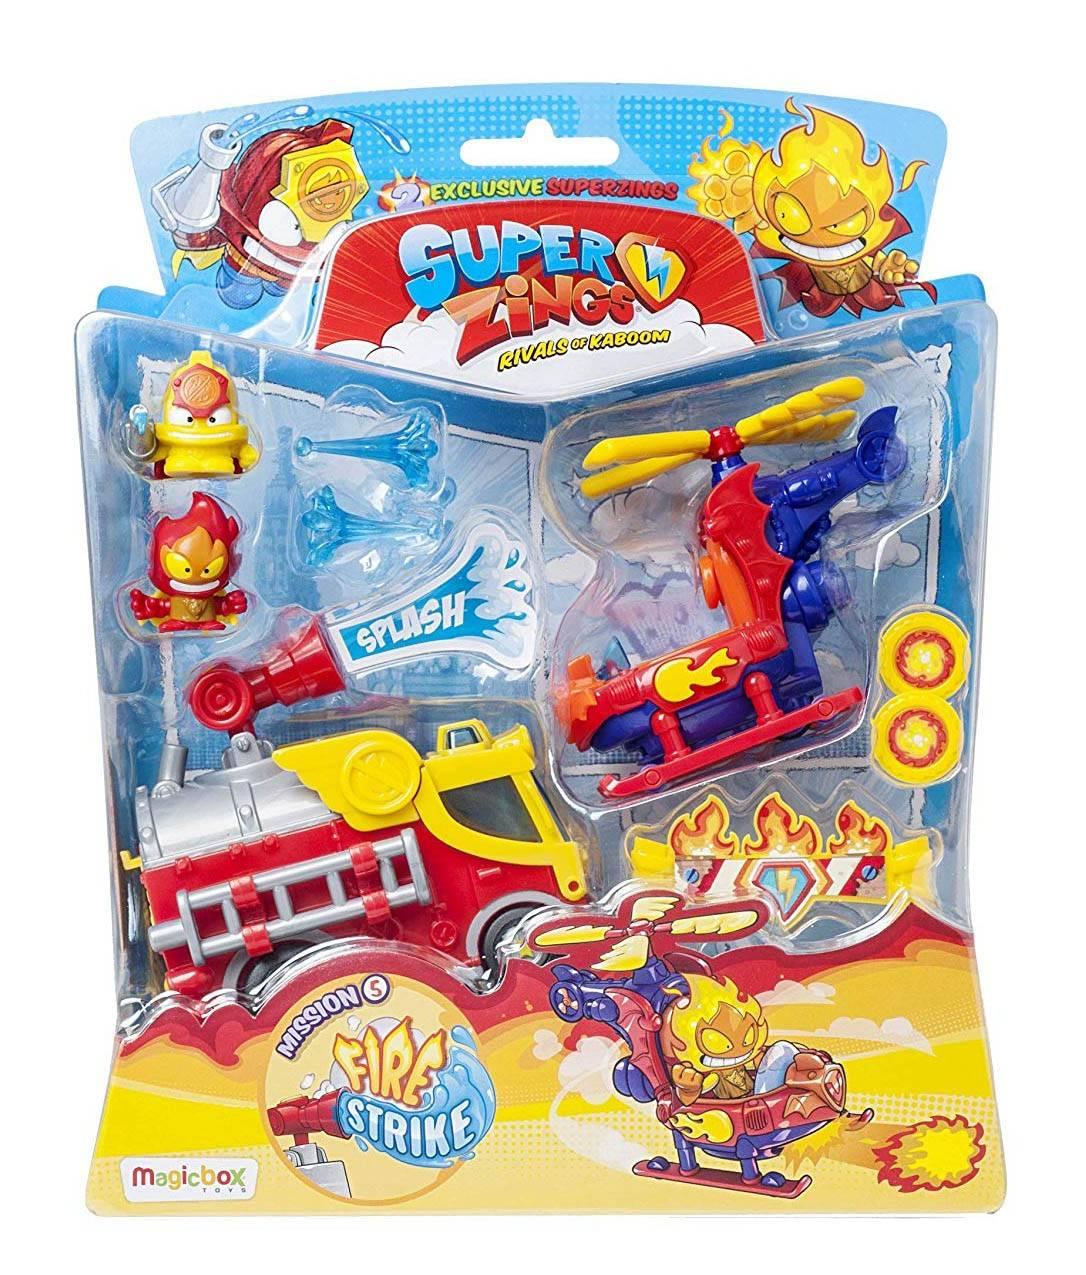 Super Zings mission fire strike